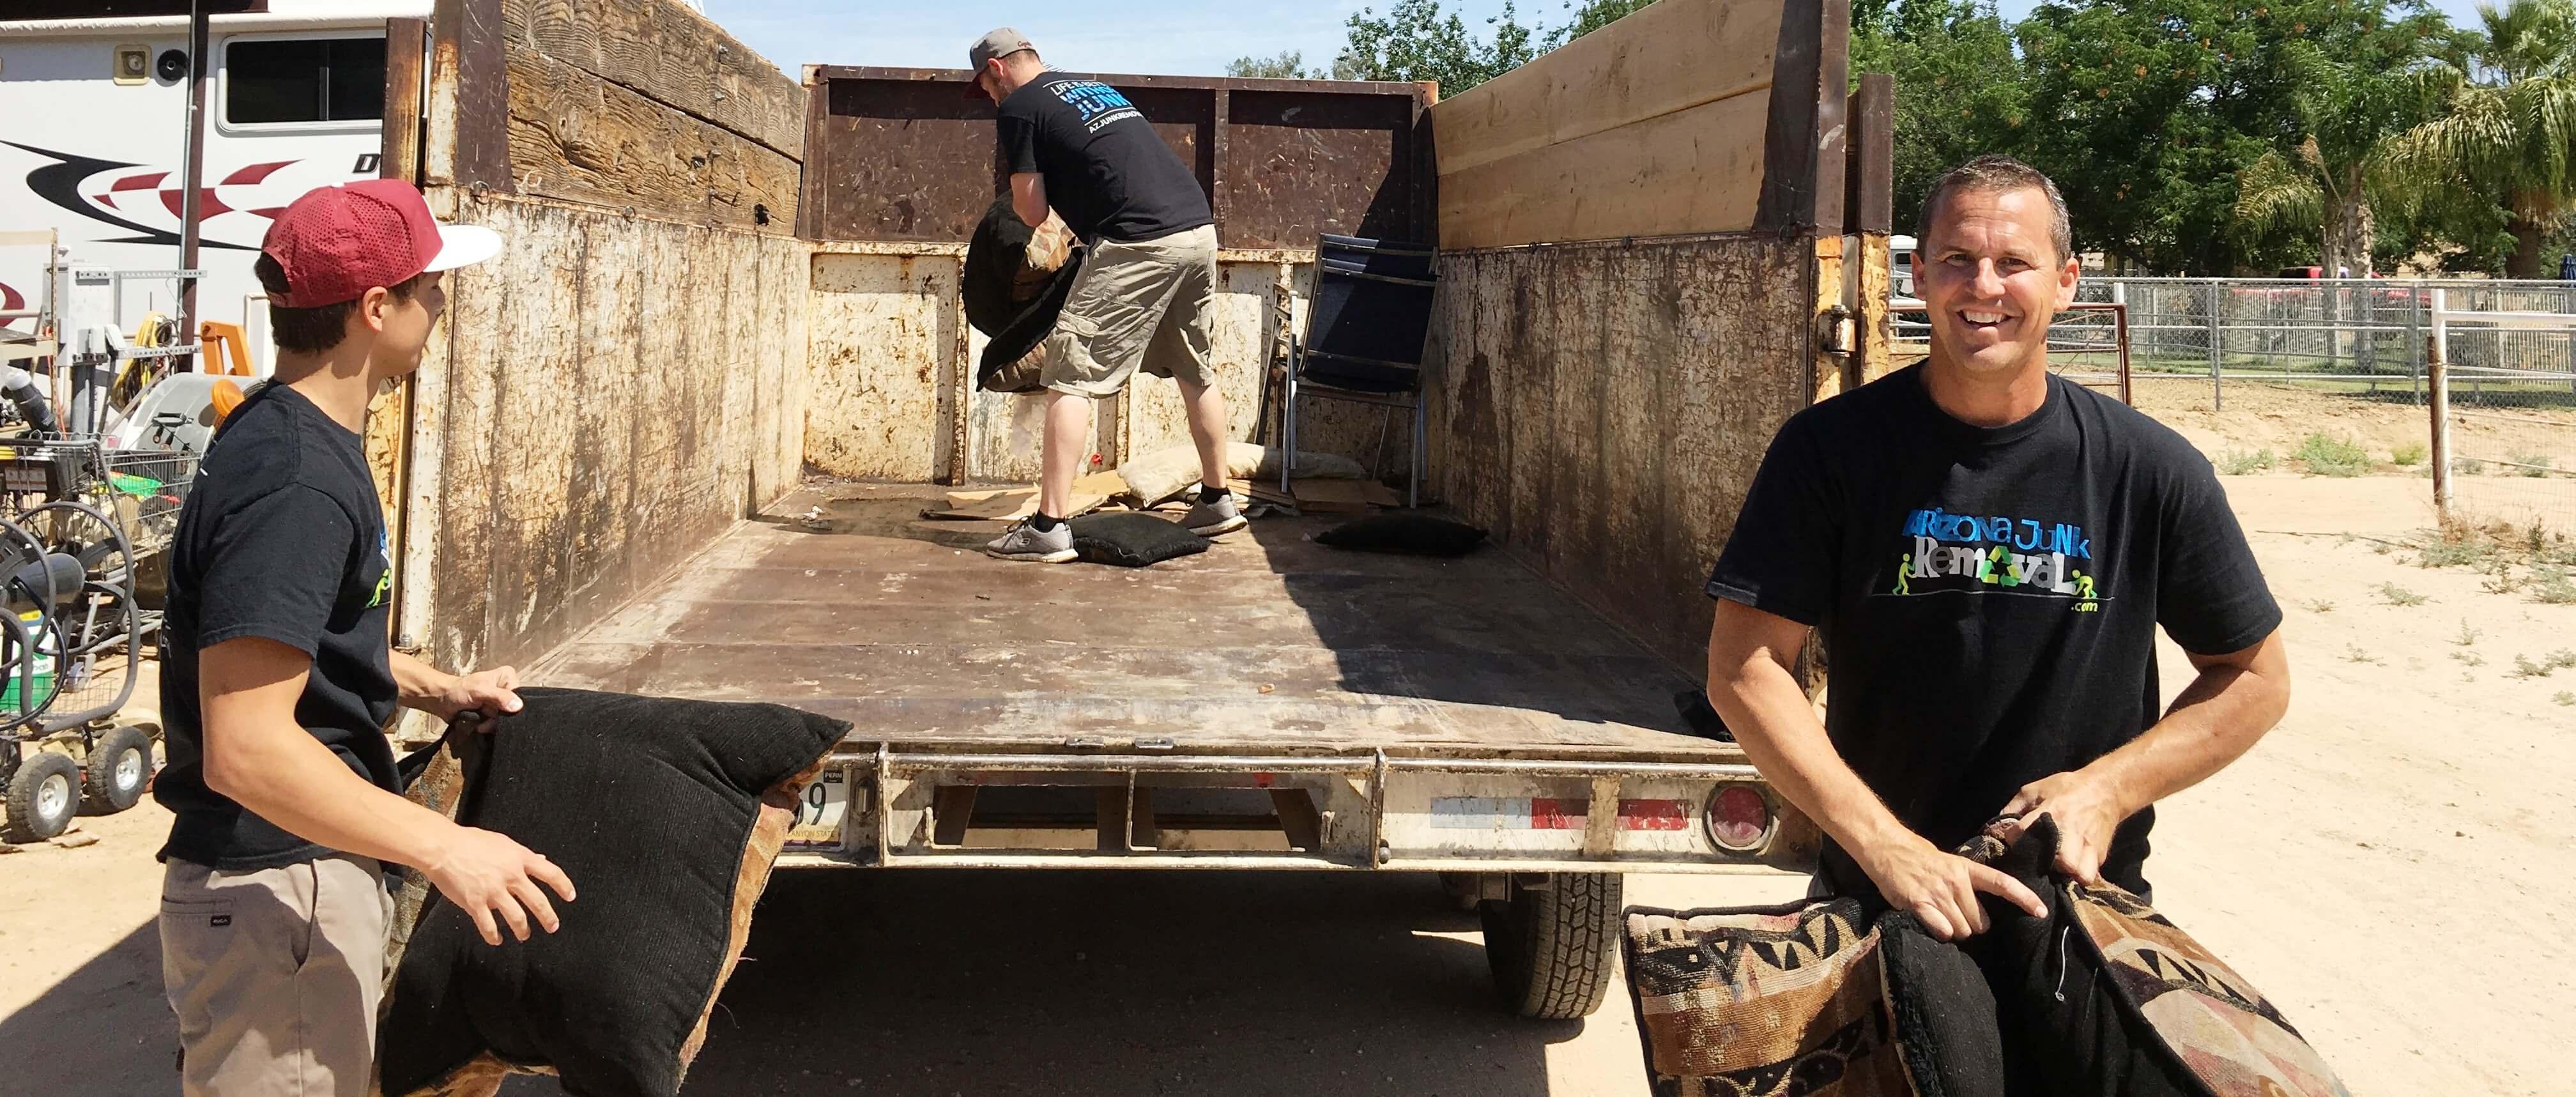 Best local az junk removal - Arizona Junk Removal